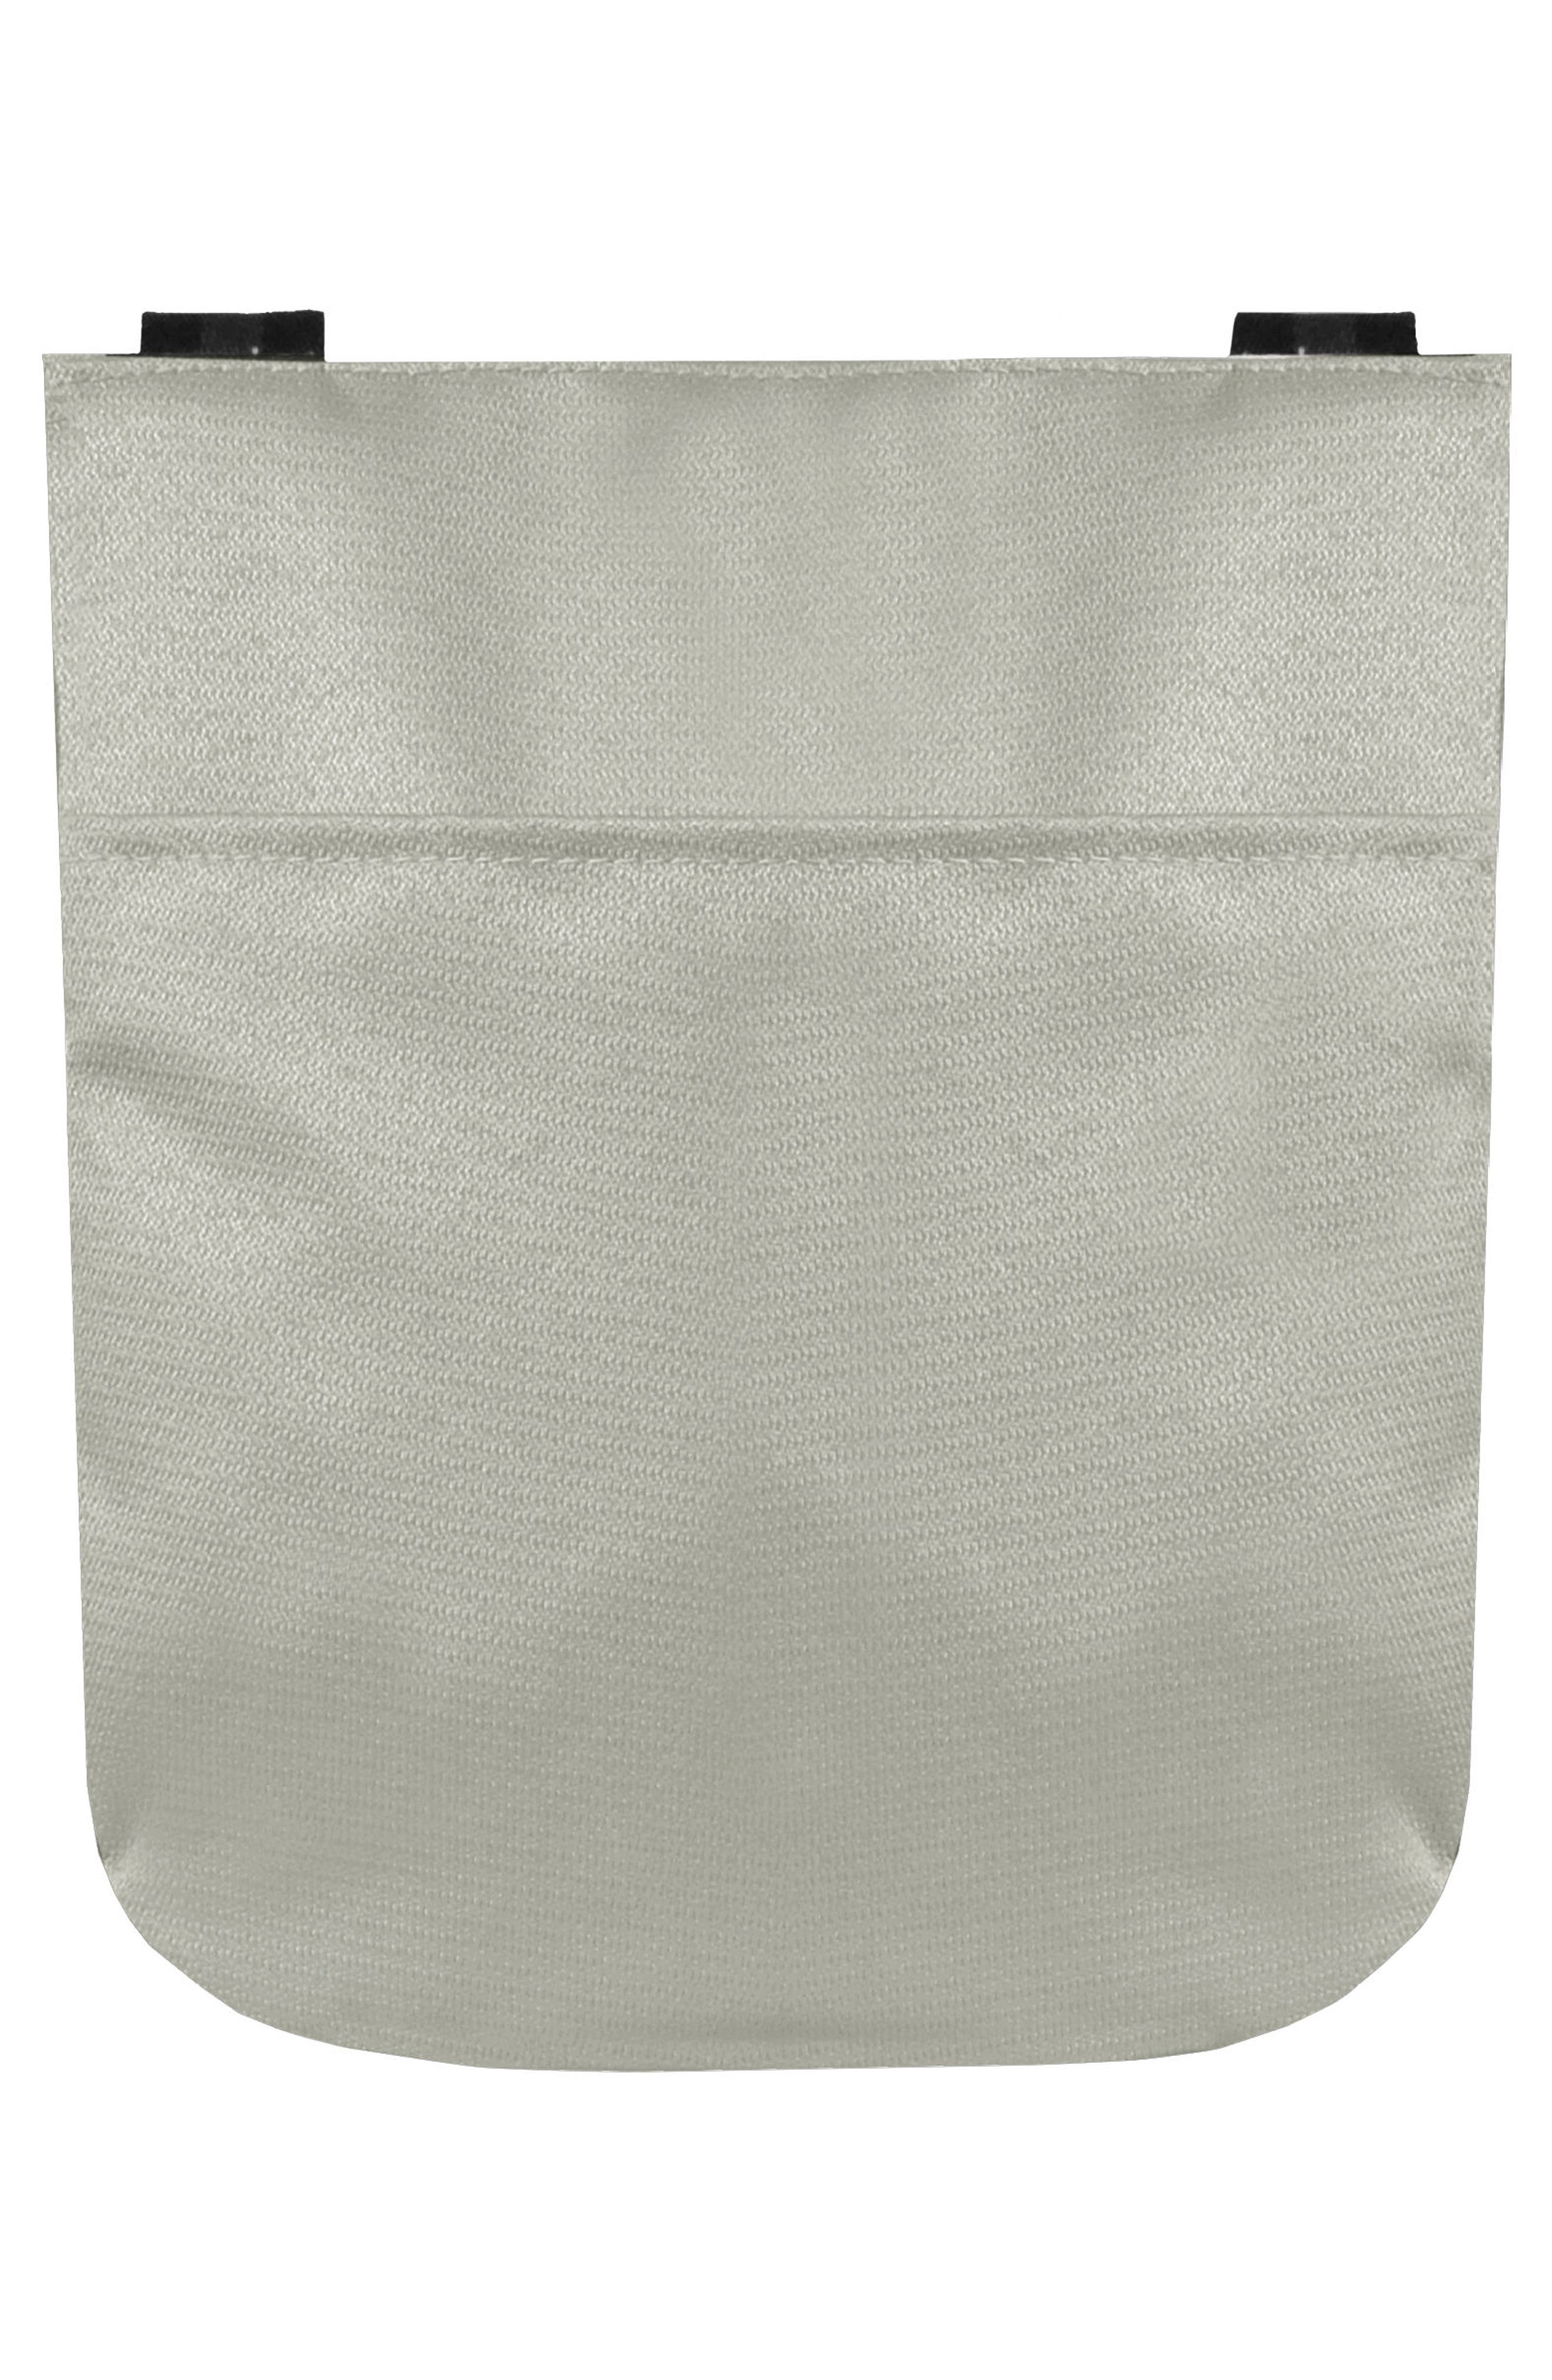 Alternate Image 2  - Sherpani Small Pica Crossbody Bag